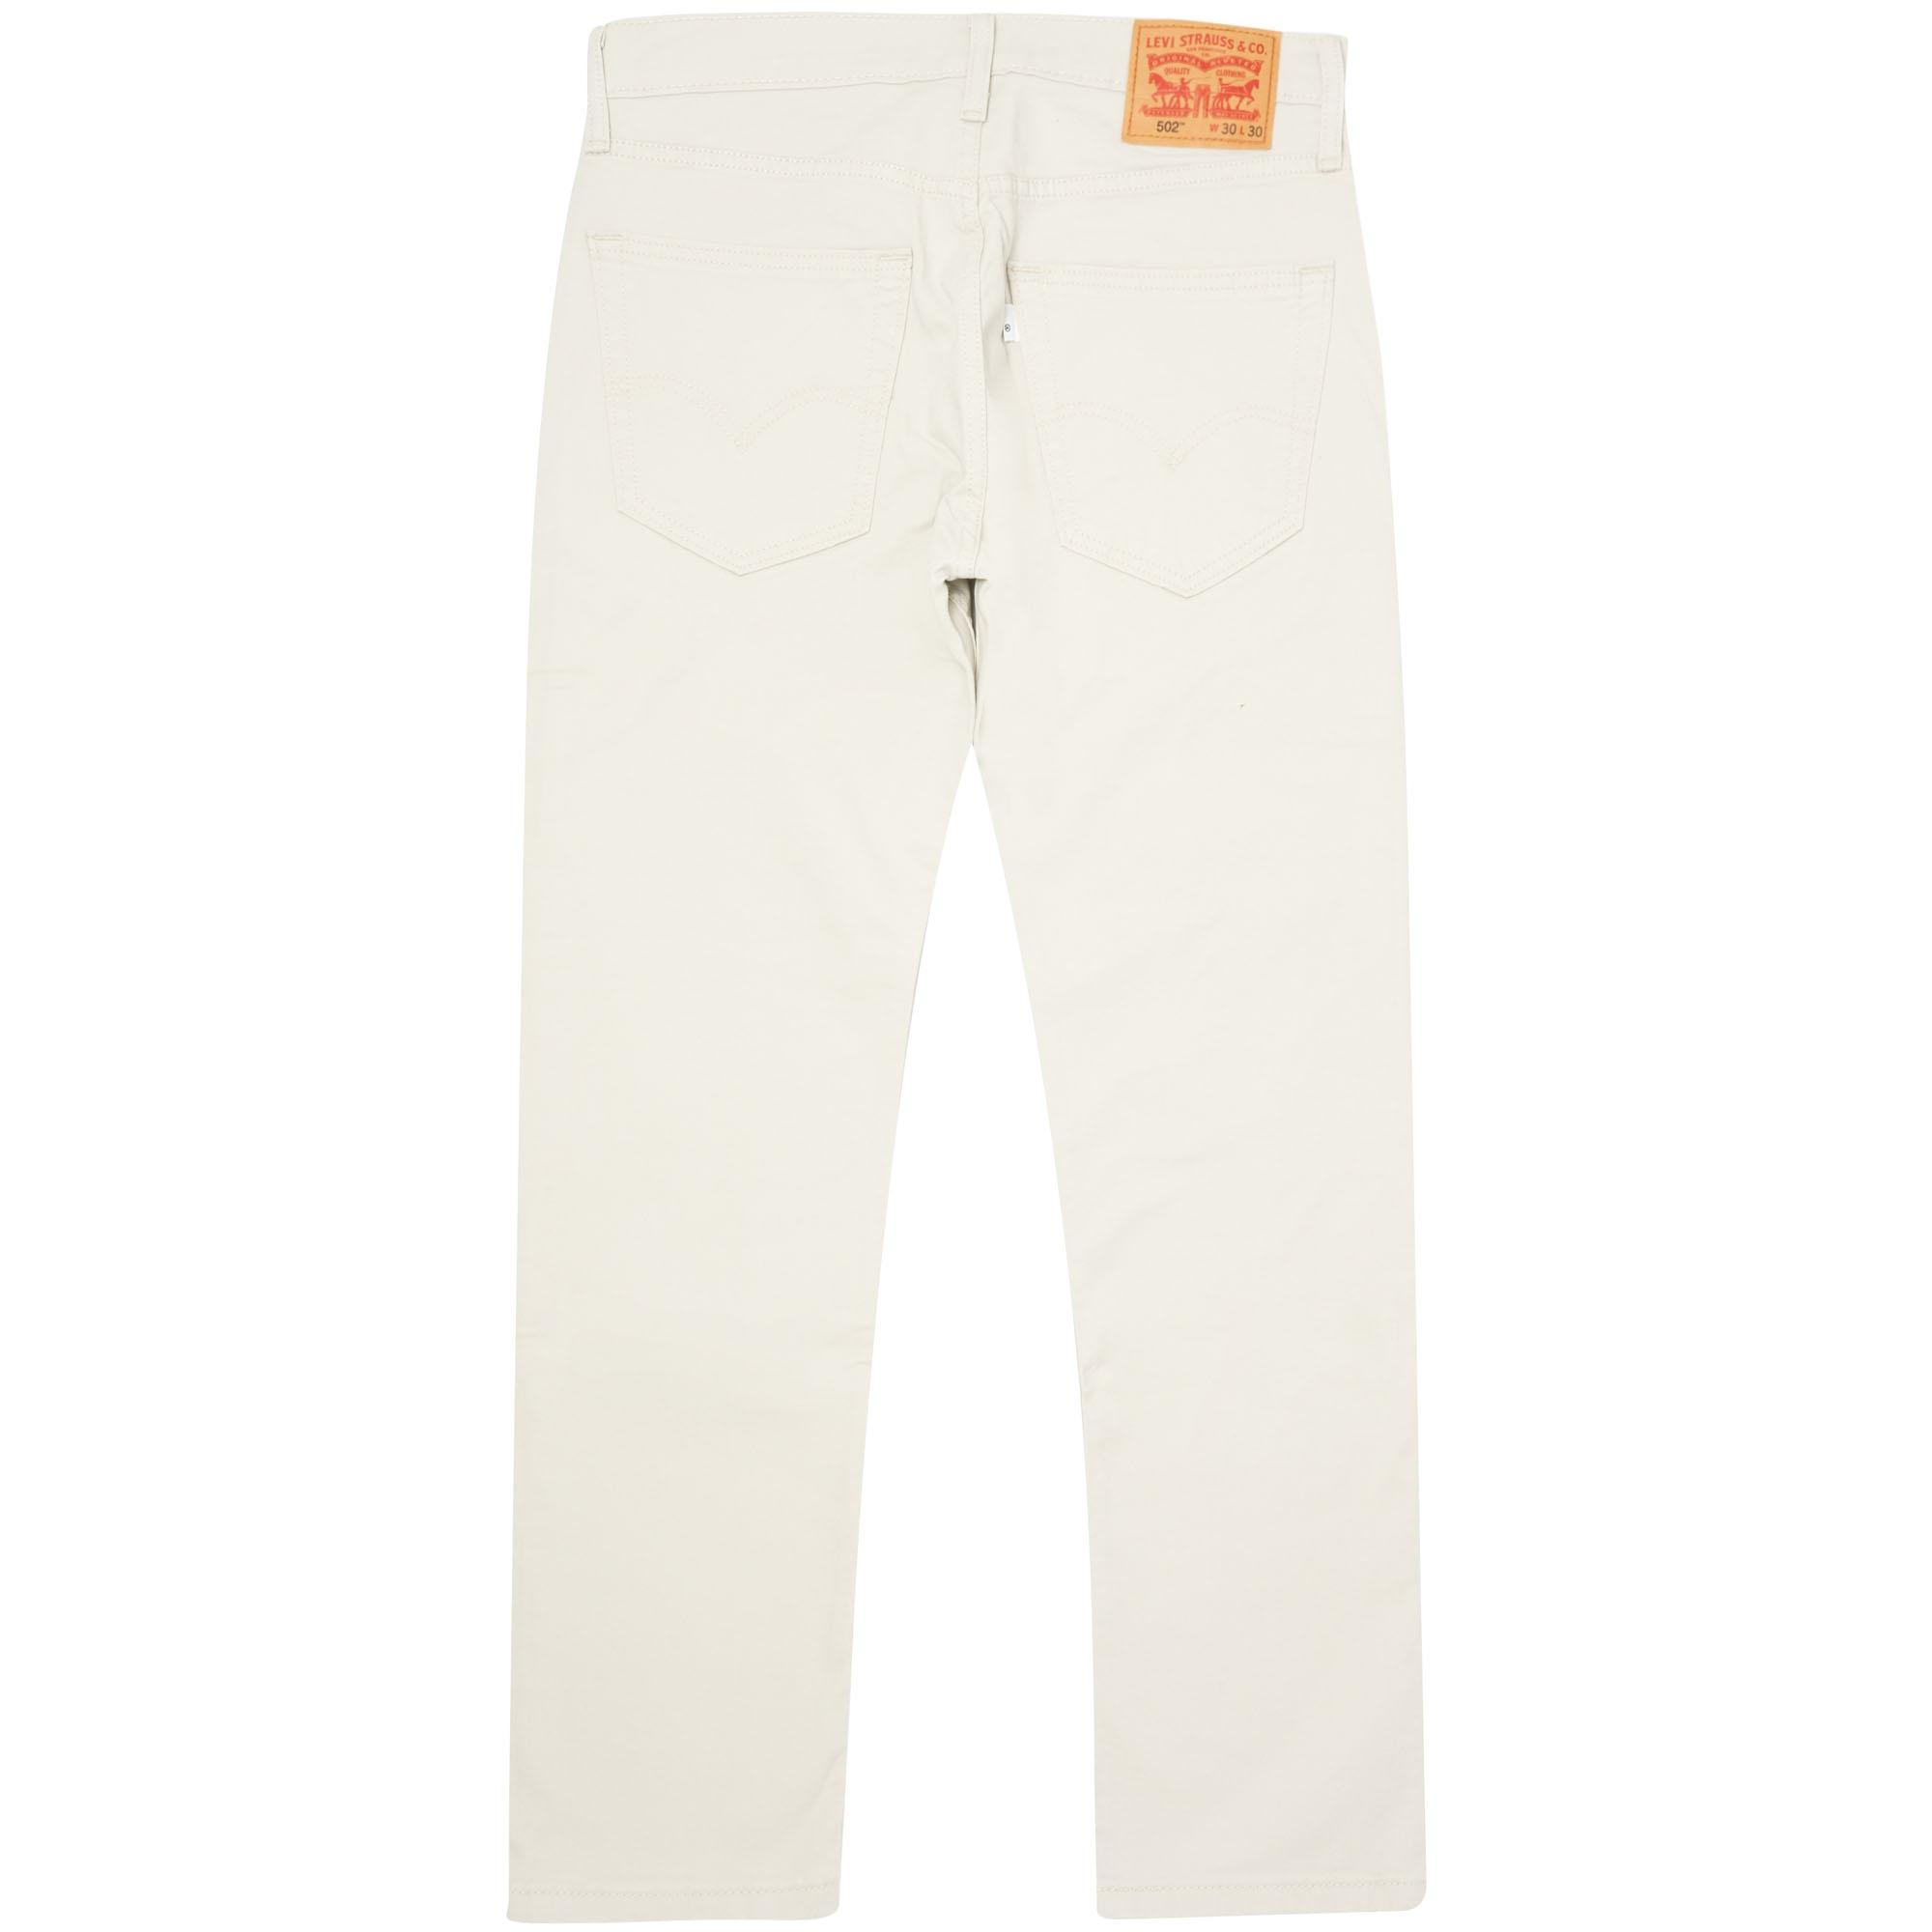 Levi's 502tm Moon Denim Jeans - Regular Tapered Fit for Men